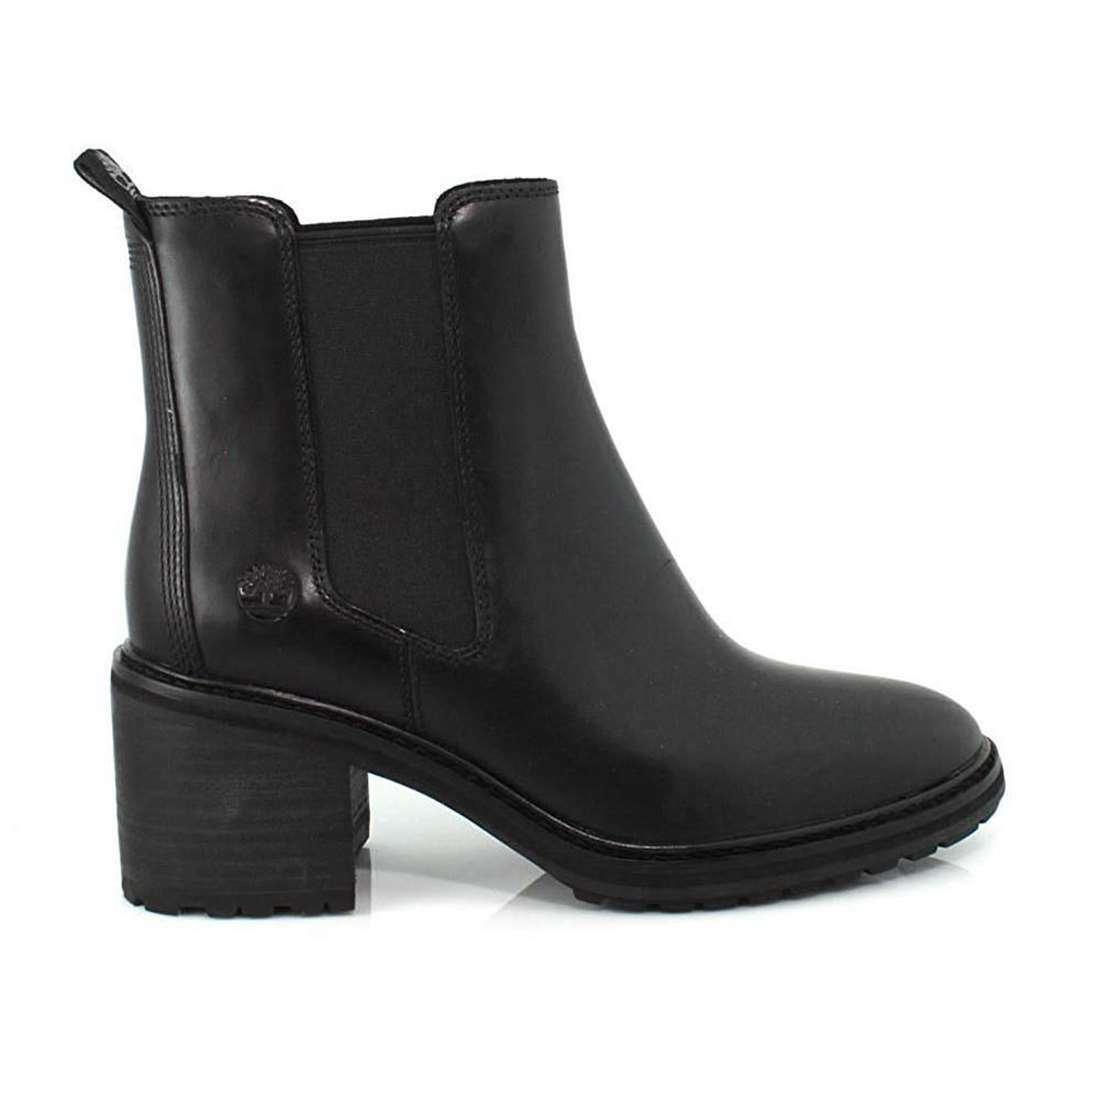 Timberland Women Sienna High Chelsea Block Heel Slip On Leather Boots